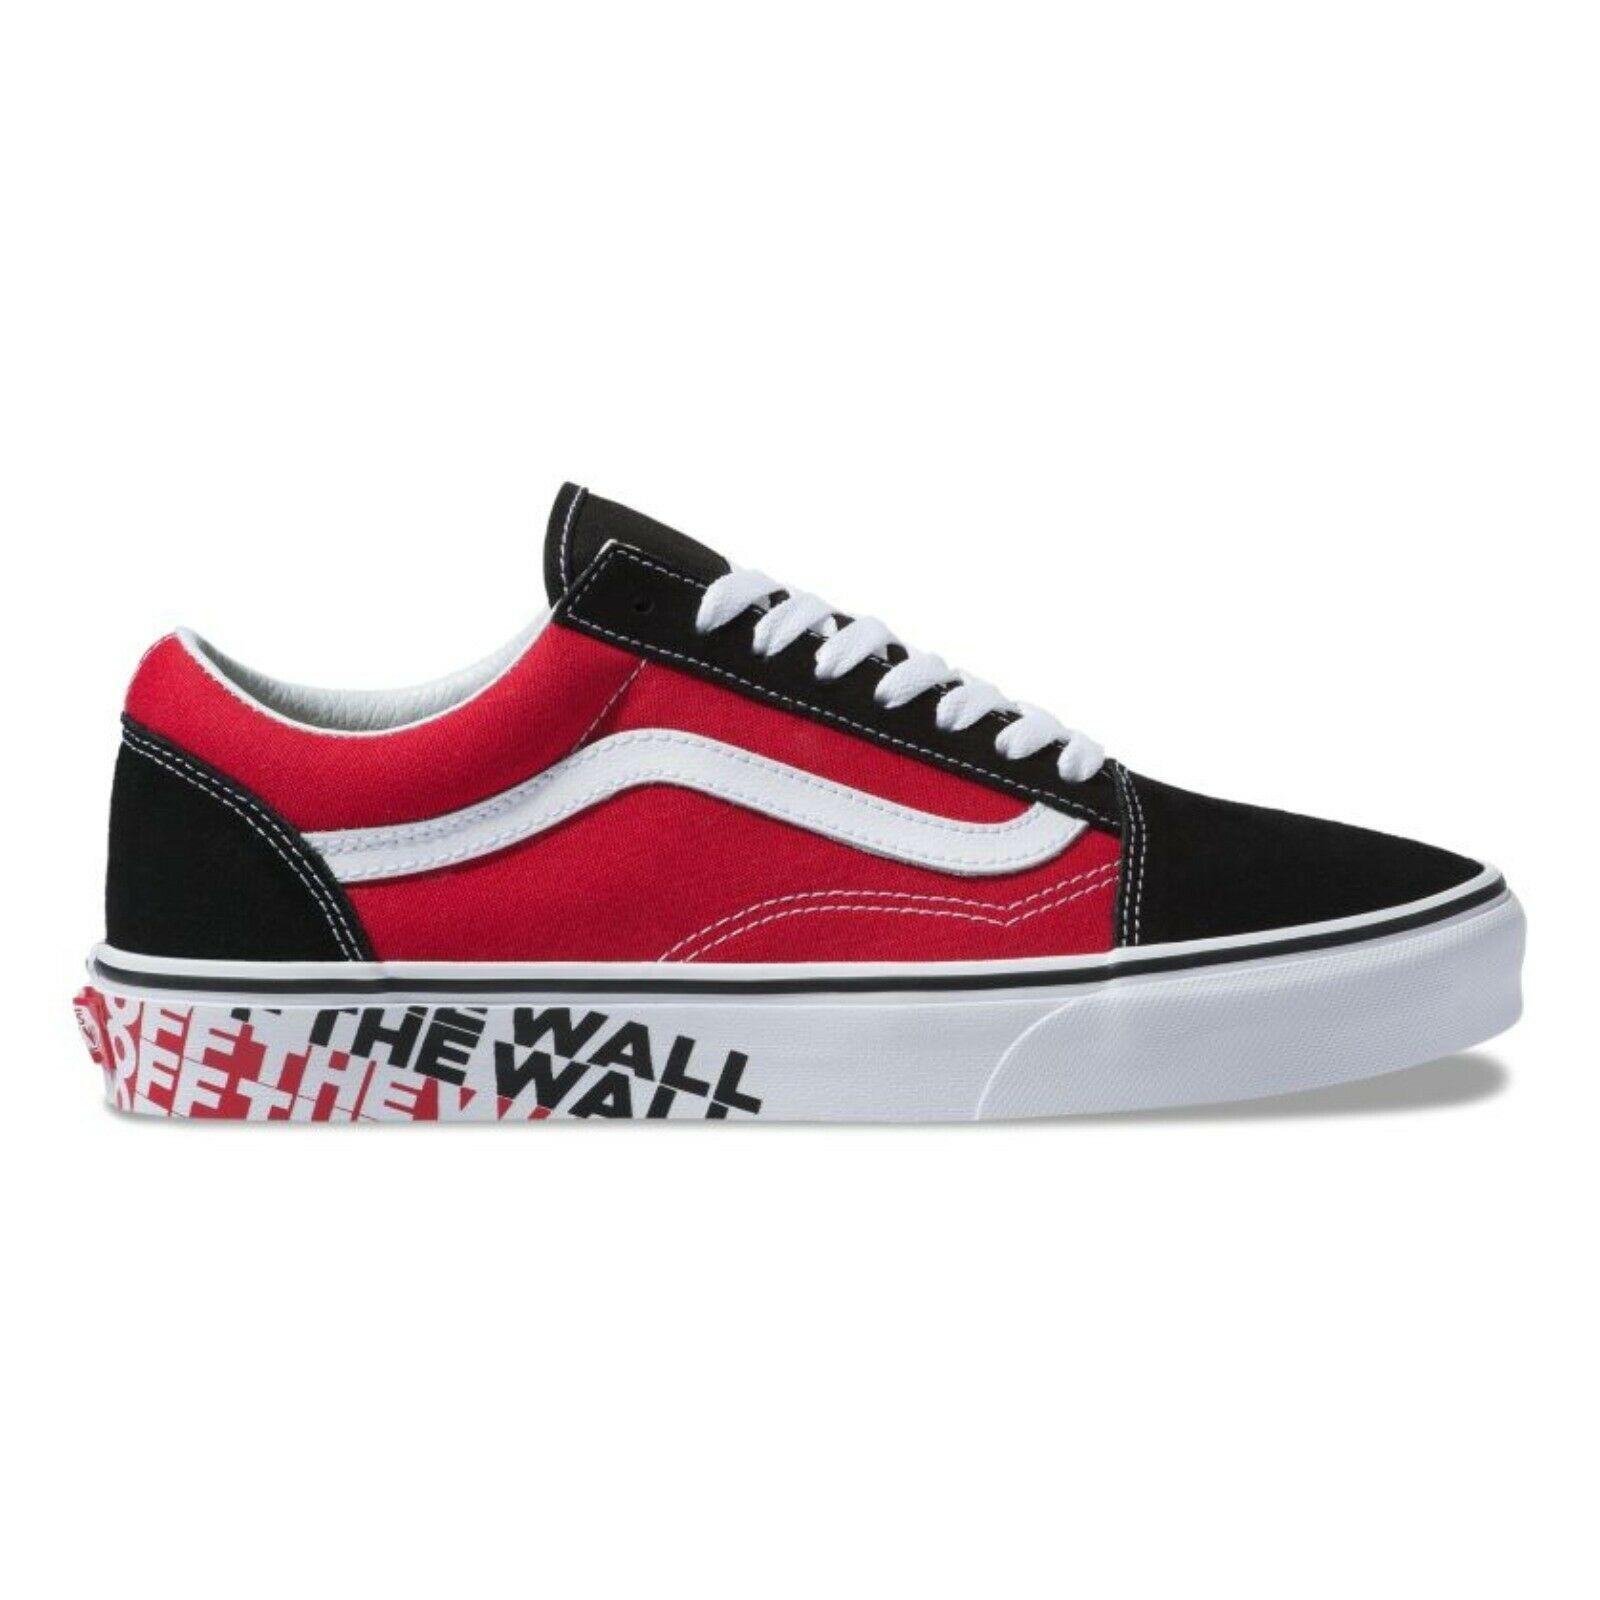 f426f0e5b675 New Vans Old Skool OTW Sidewall Black Racing Red Skate Shoes Unisex ...